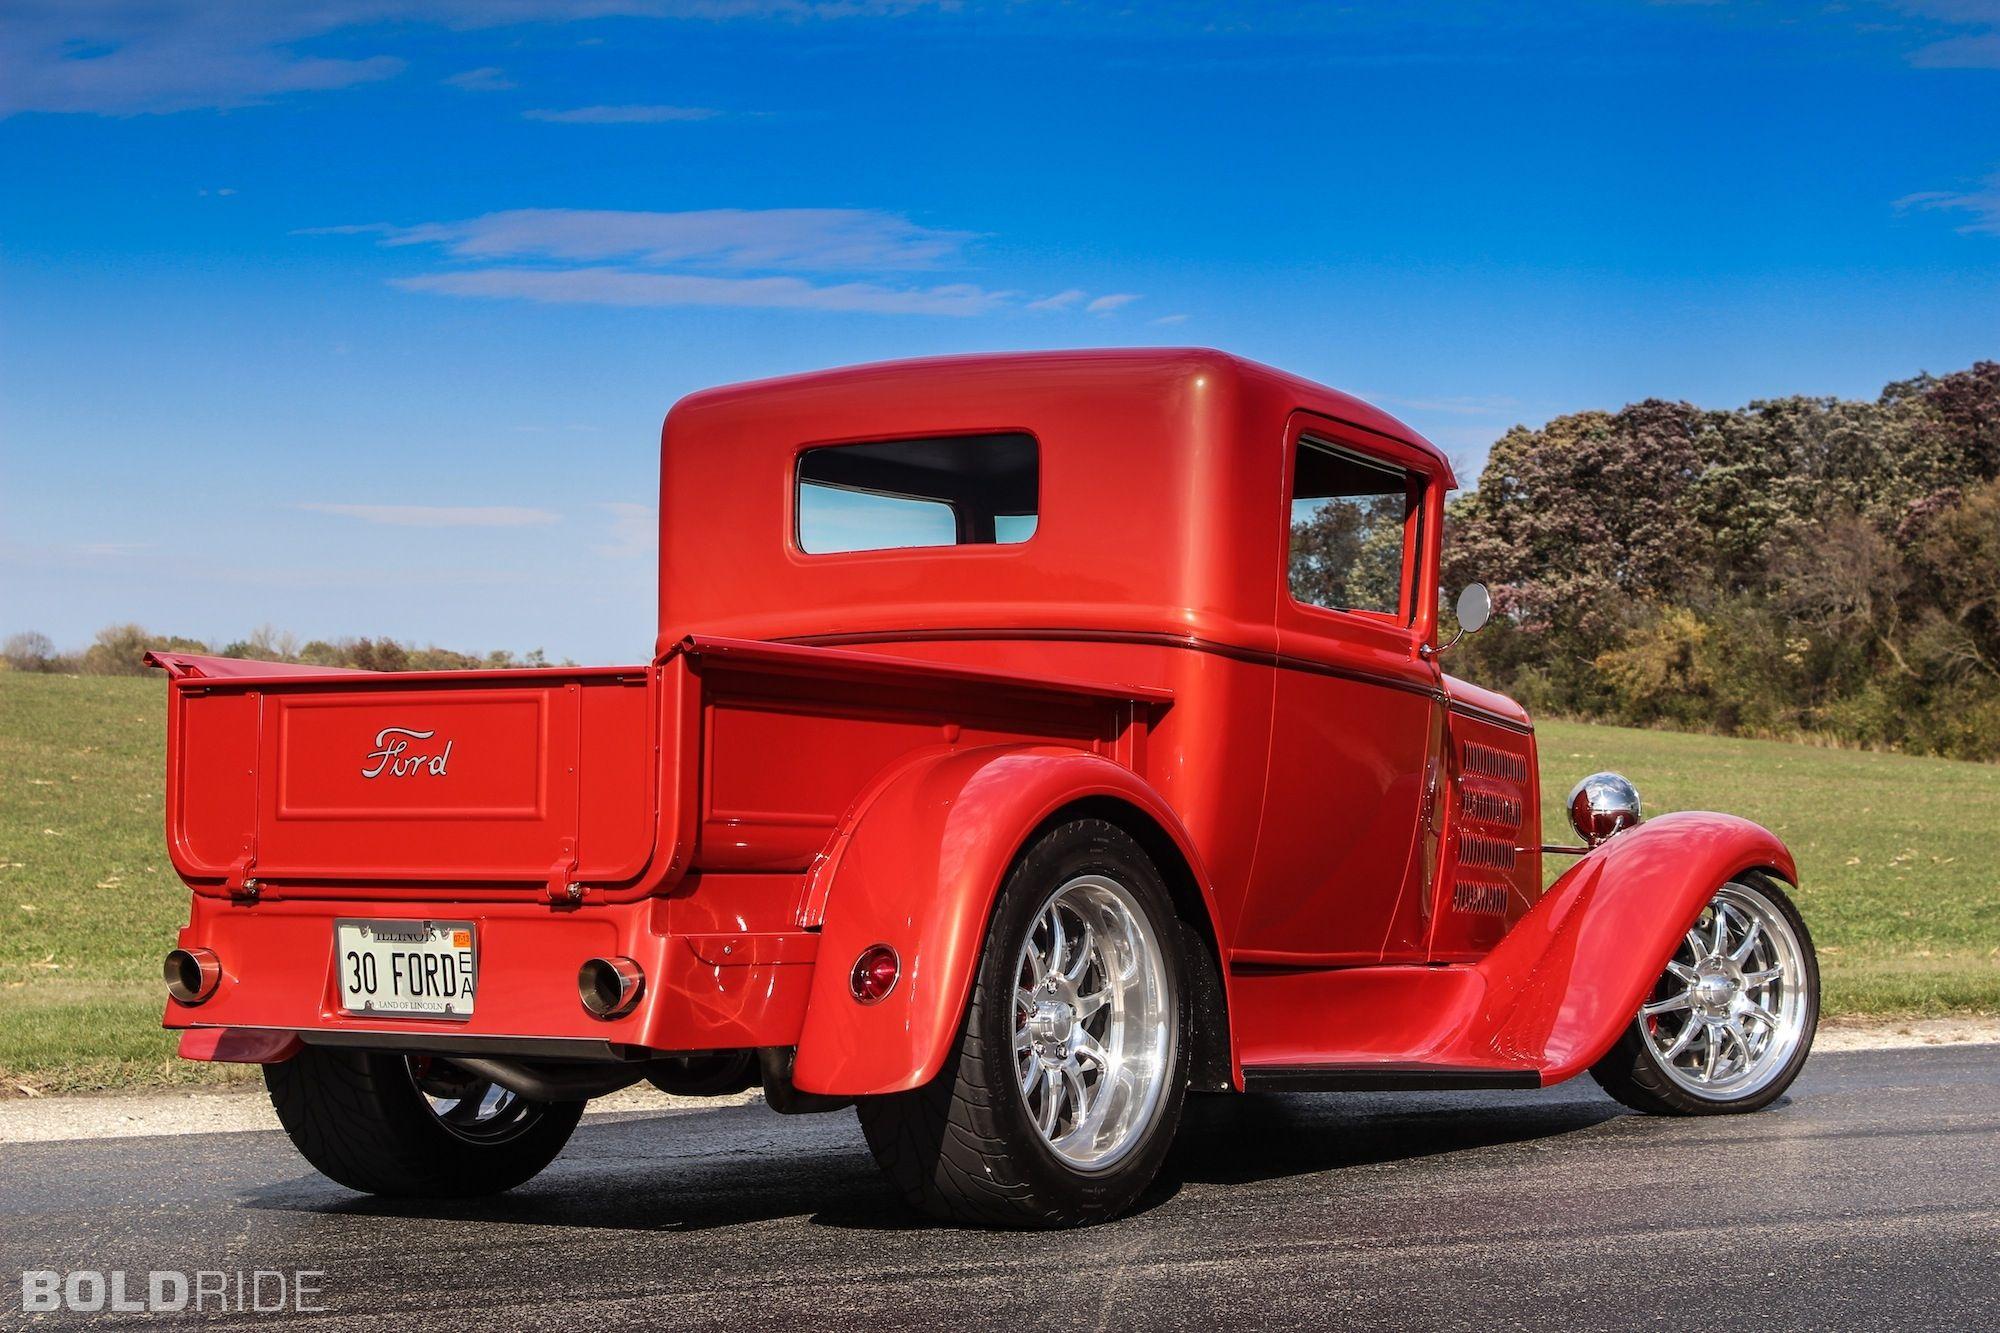 images of ford hot rod trucks 1930 ford model pickup custom hot rod rods retro truck trucks. Black Bedroom Furniture Sets. Home Design Ideas